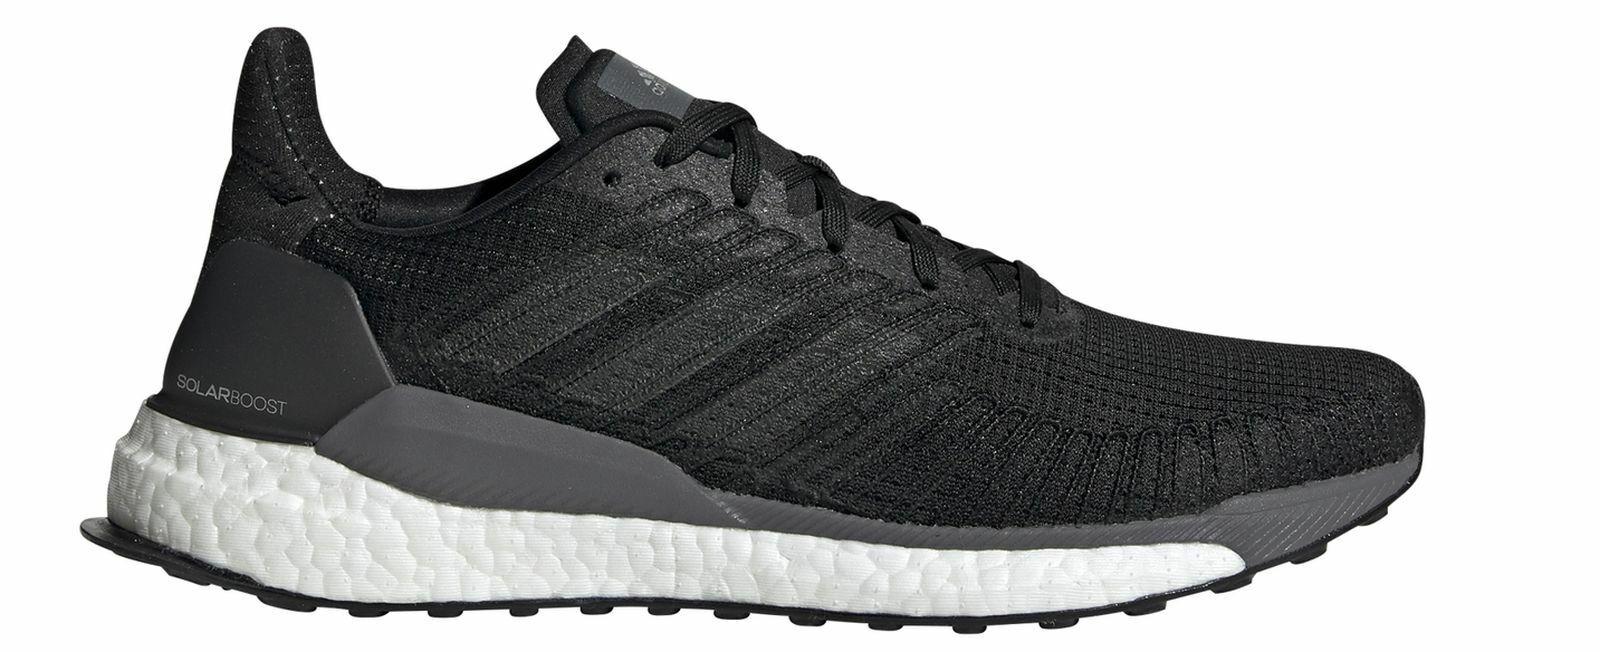 Adidas performance señores mentecato solar Boost 19 m Core negro